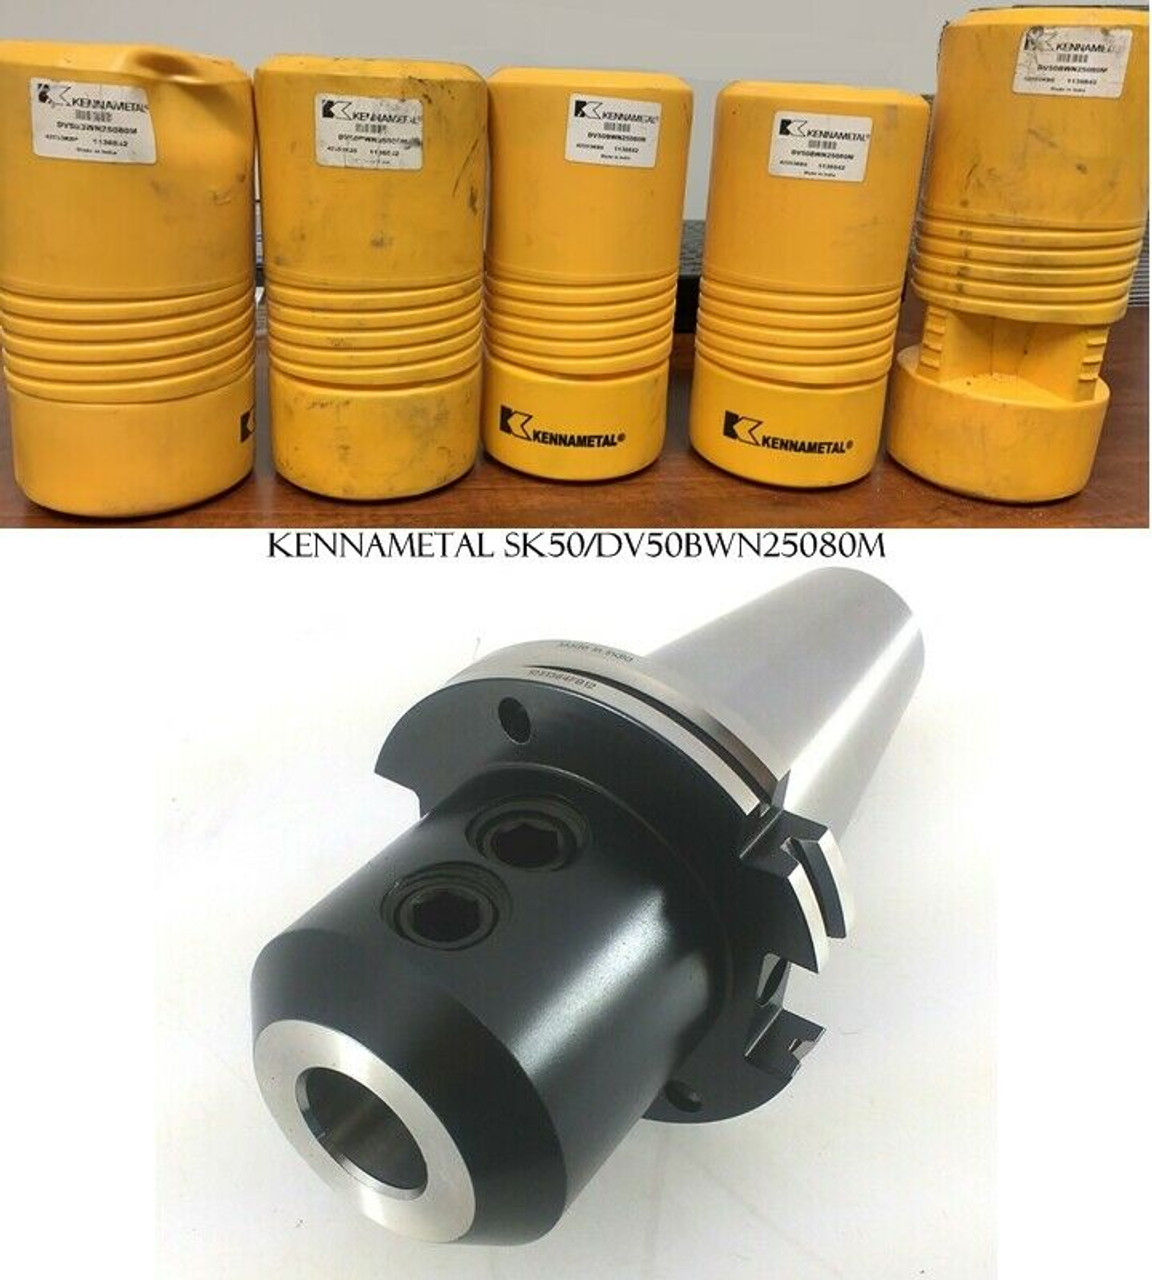 KENNAMETAL SK50/DV50BWN25080M 25MM WHISTLE NOTCH ENDMILL HOLDER